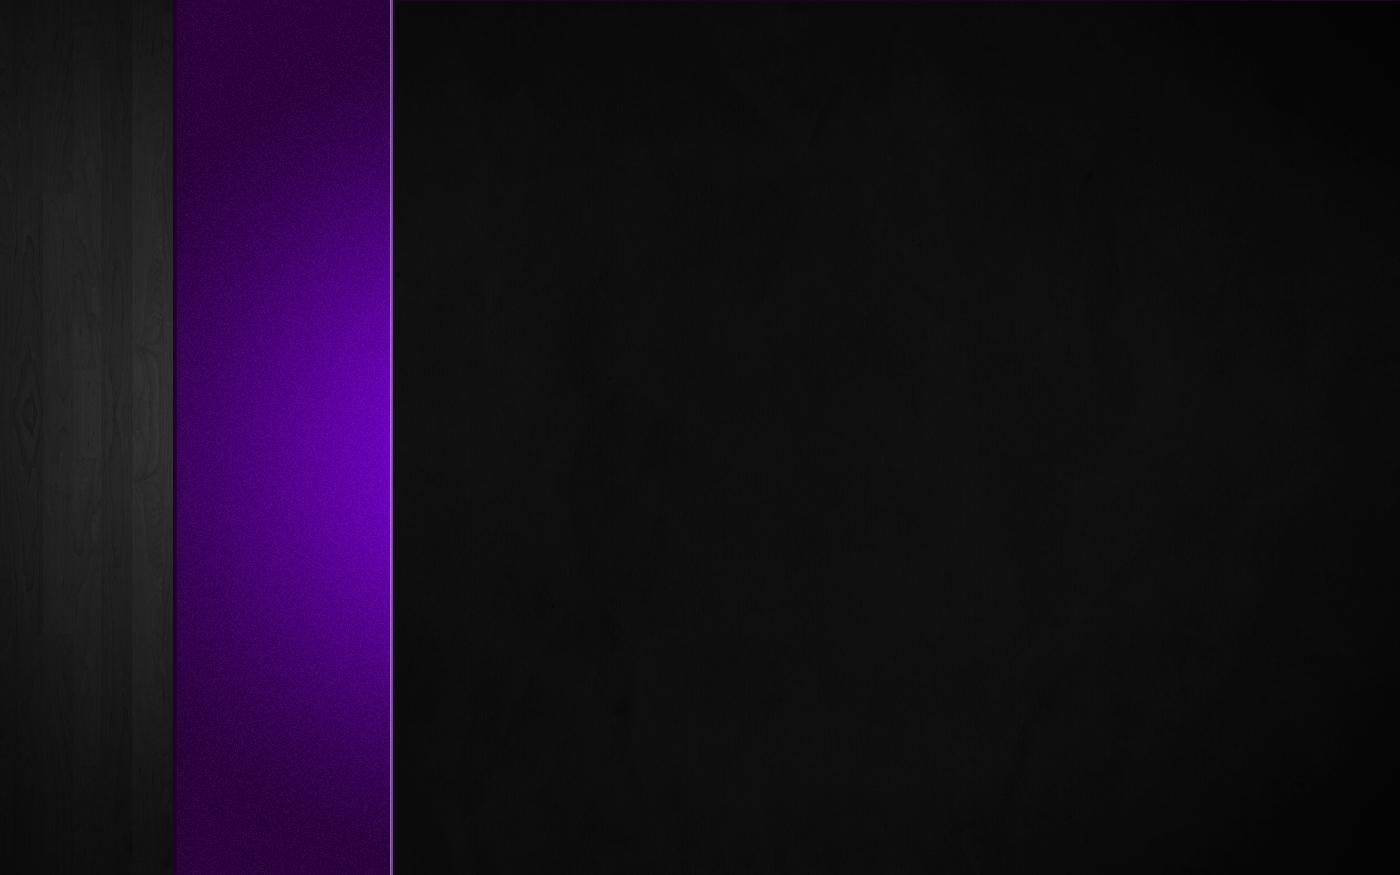 black and purple wallpaper Cool Wallpaper 1400x875